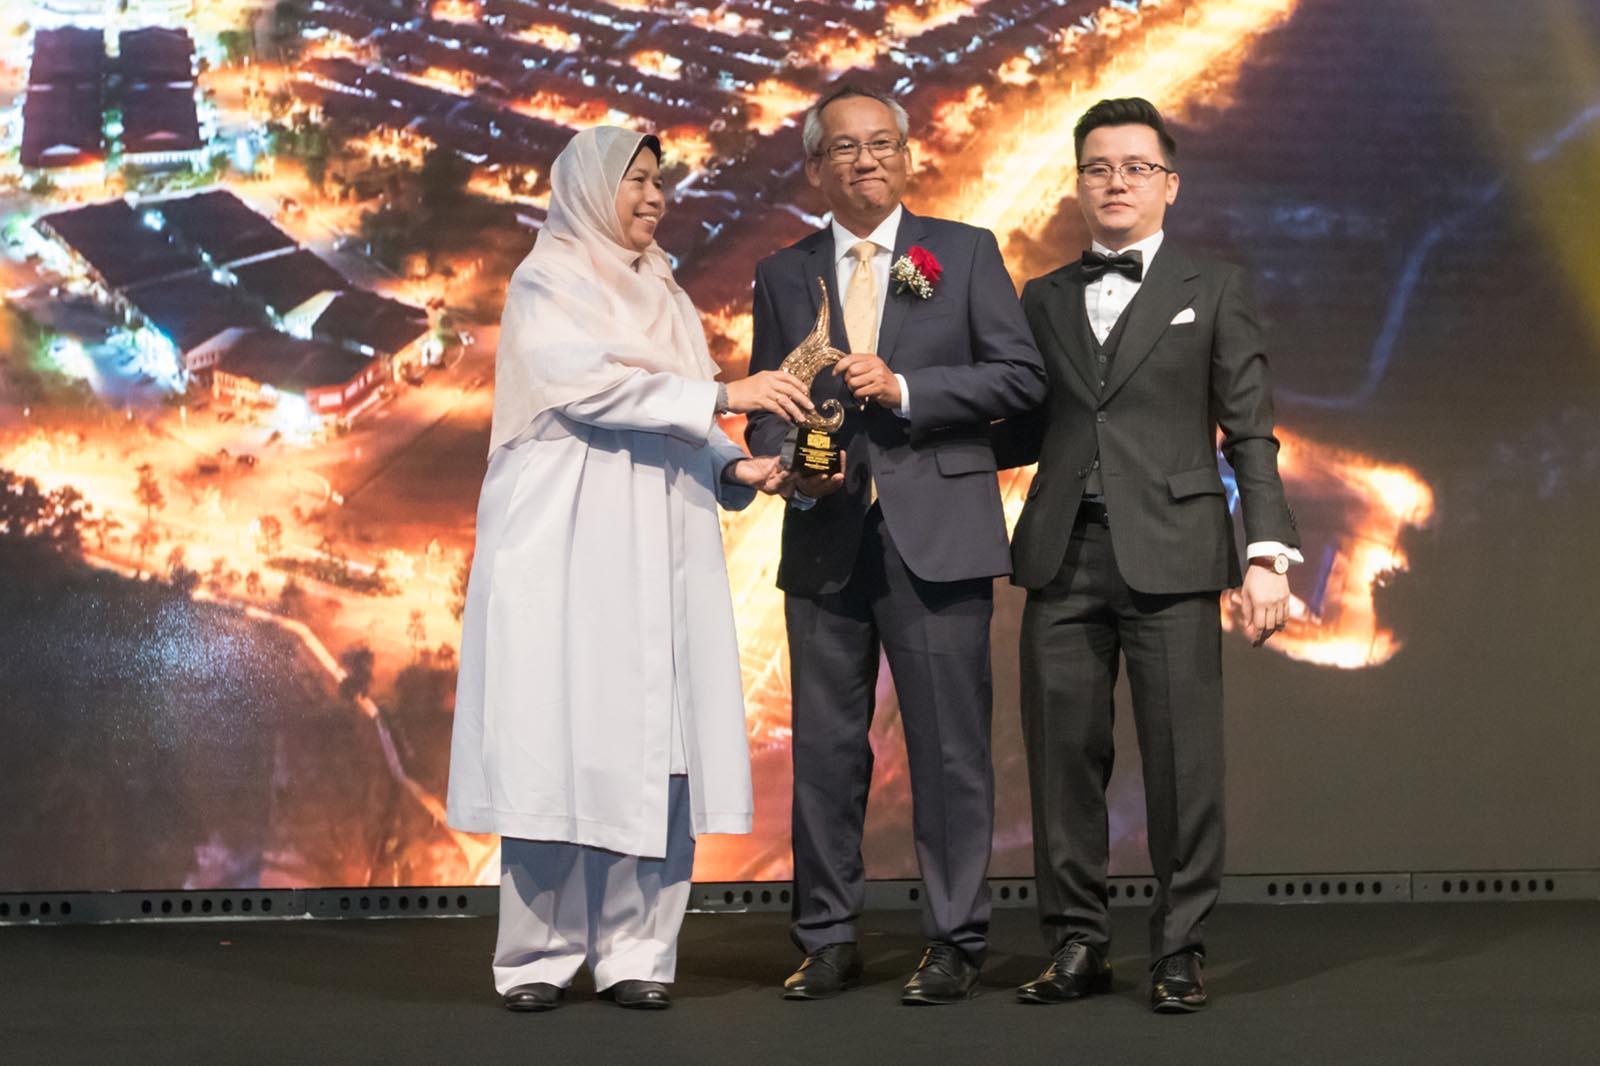 1 June 2018: Property Insights Prestigious Developer Award (PIPDA) 2018 3